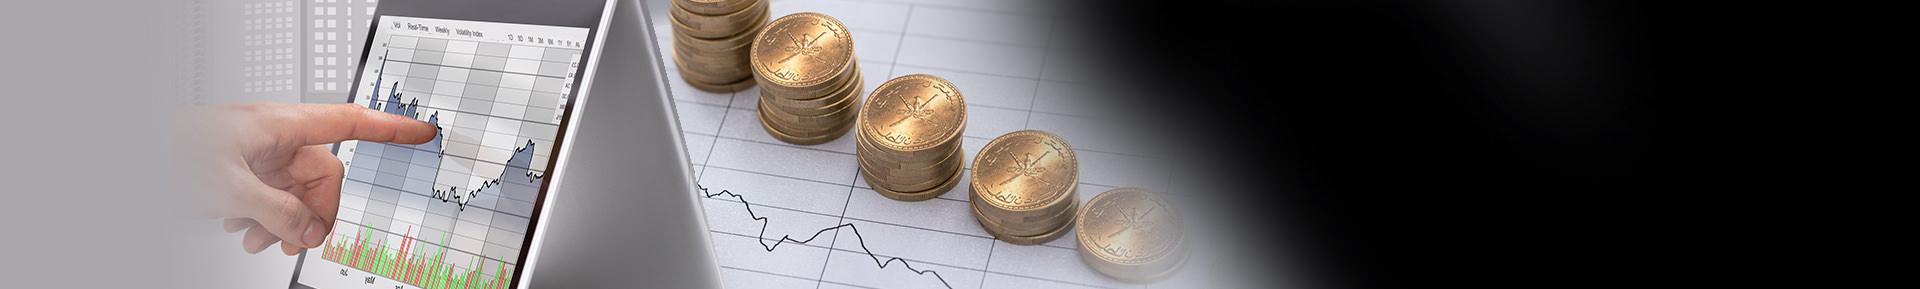 National Finance Oman